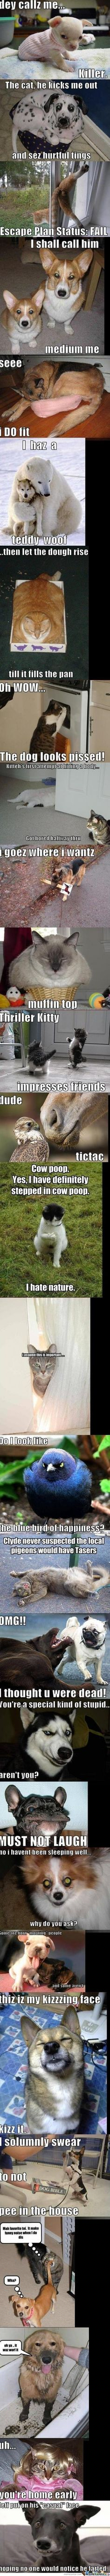 Animal Humor-Definately made me laugh!